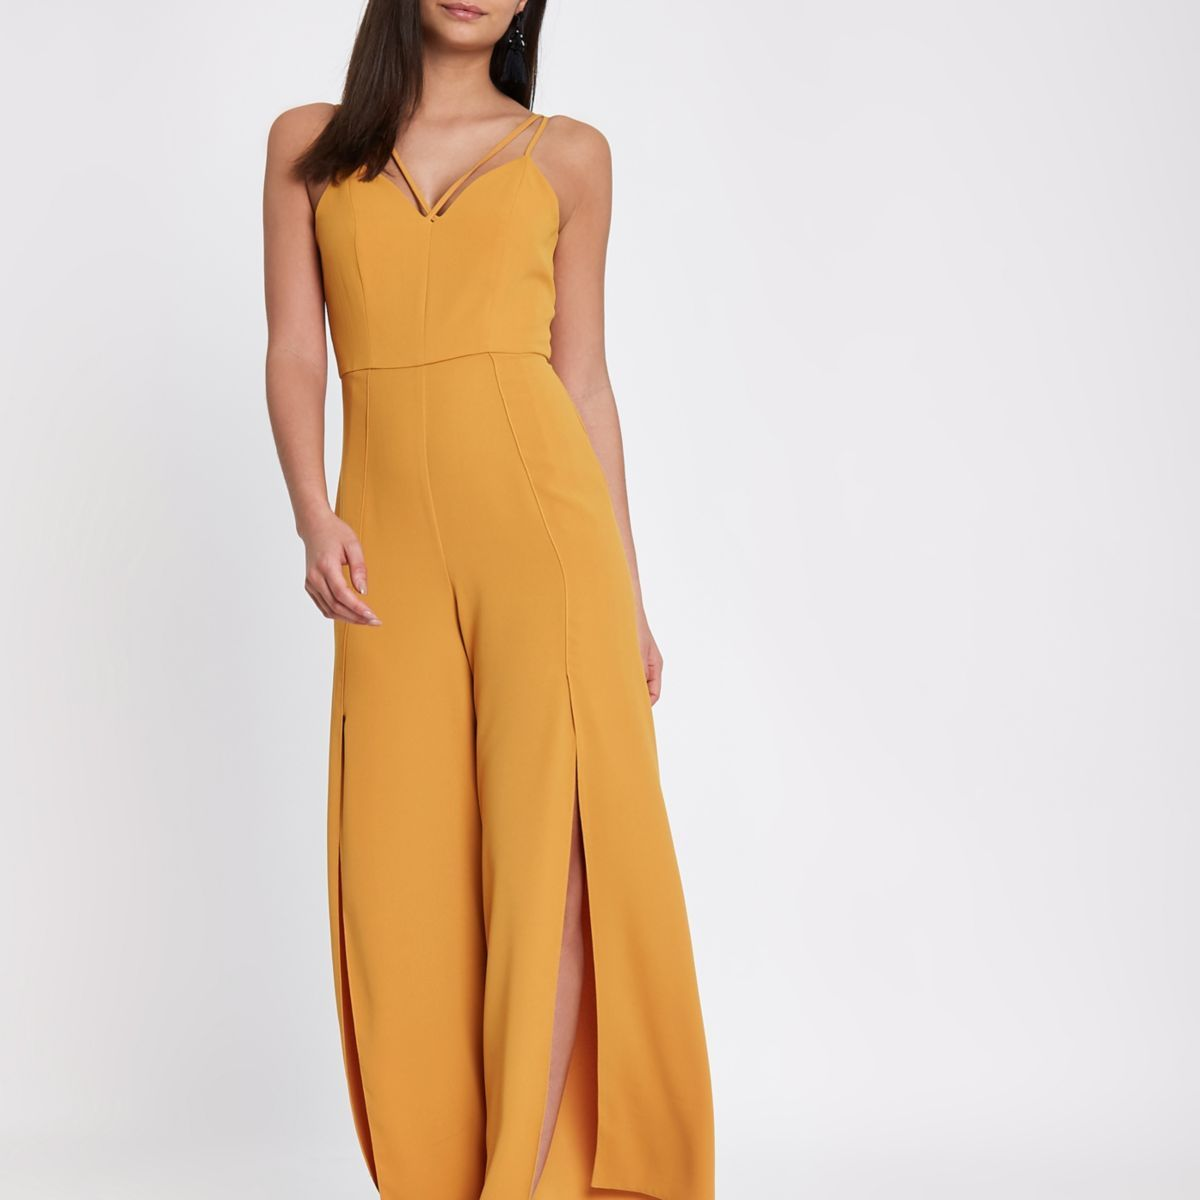 57908c41a224 Mustard yellow wide split leg cami jumpsuit - Jumpsuits - Rompers    Jumpsuits - women